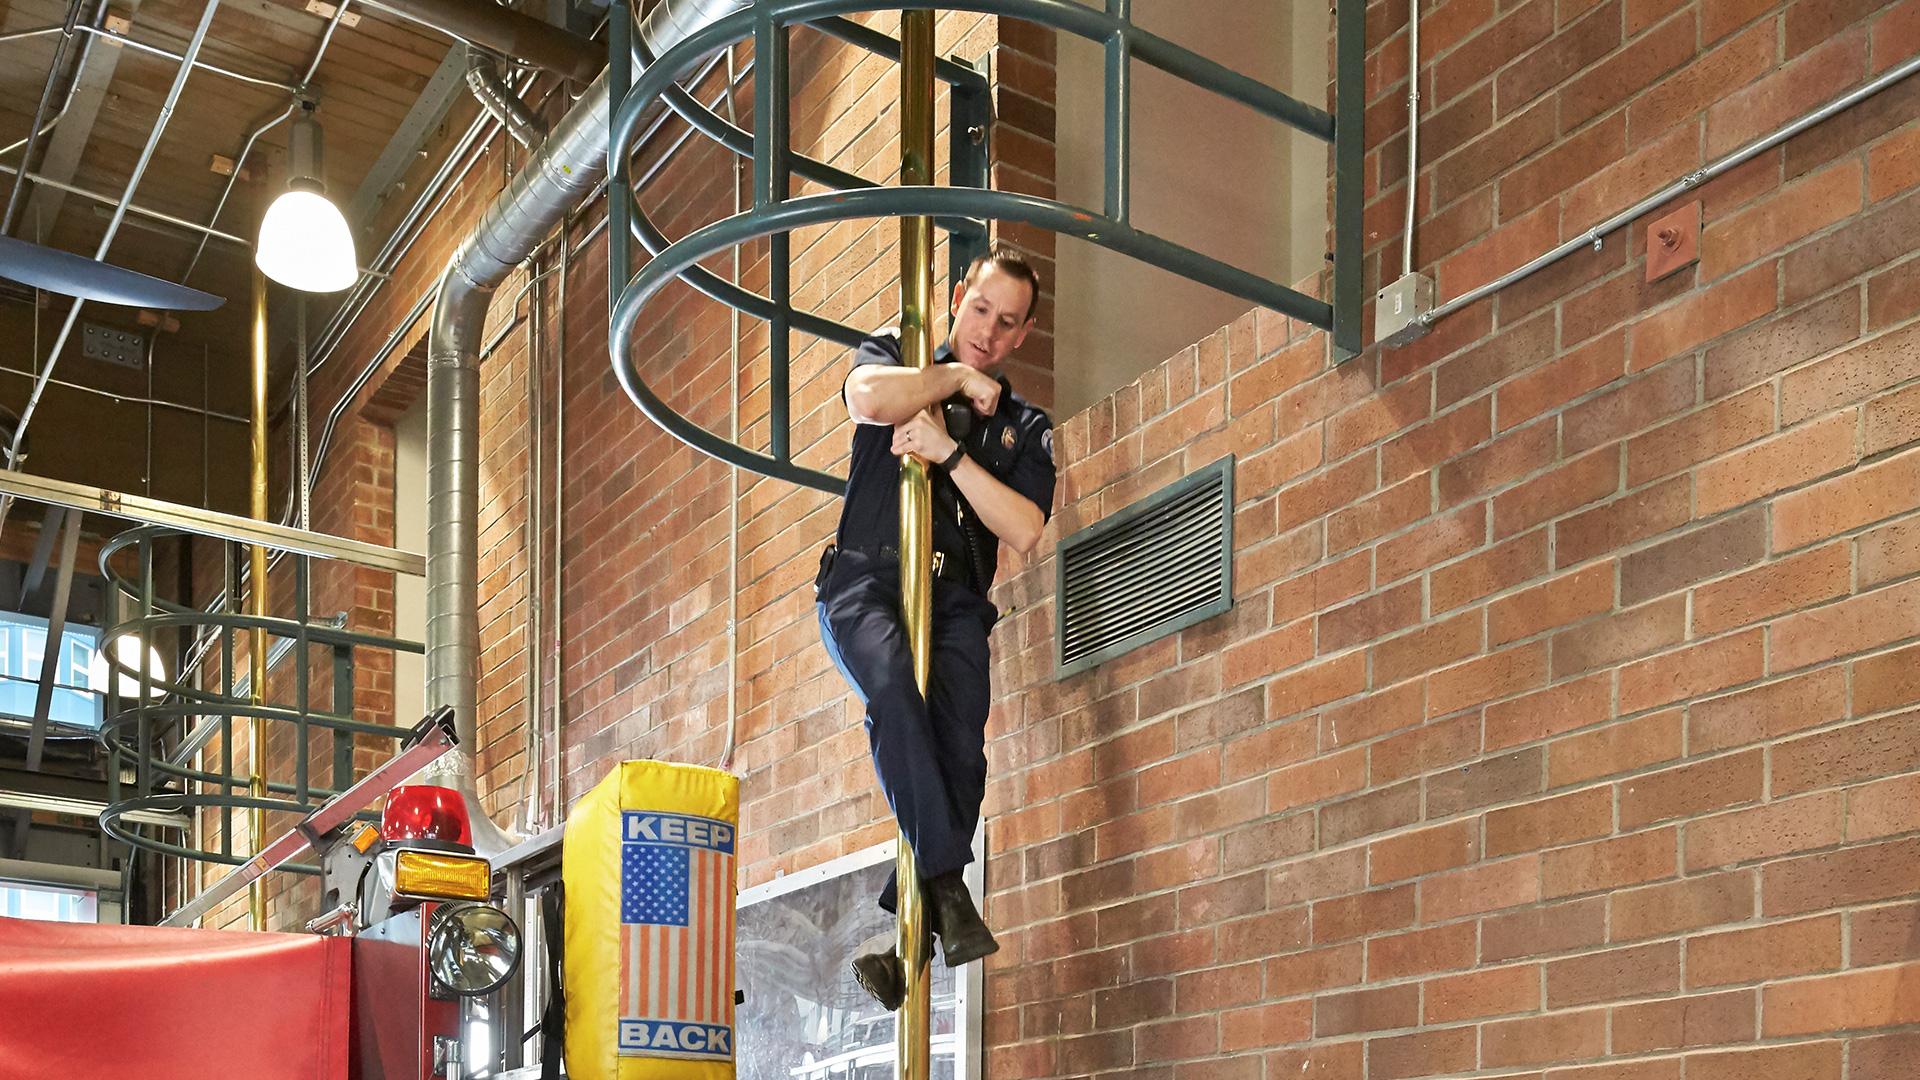 Seattle Fire Station 18